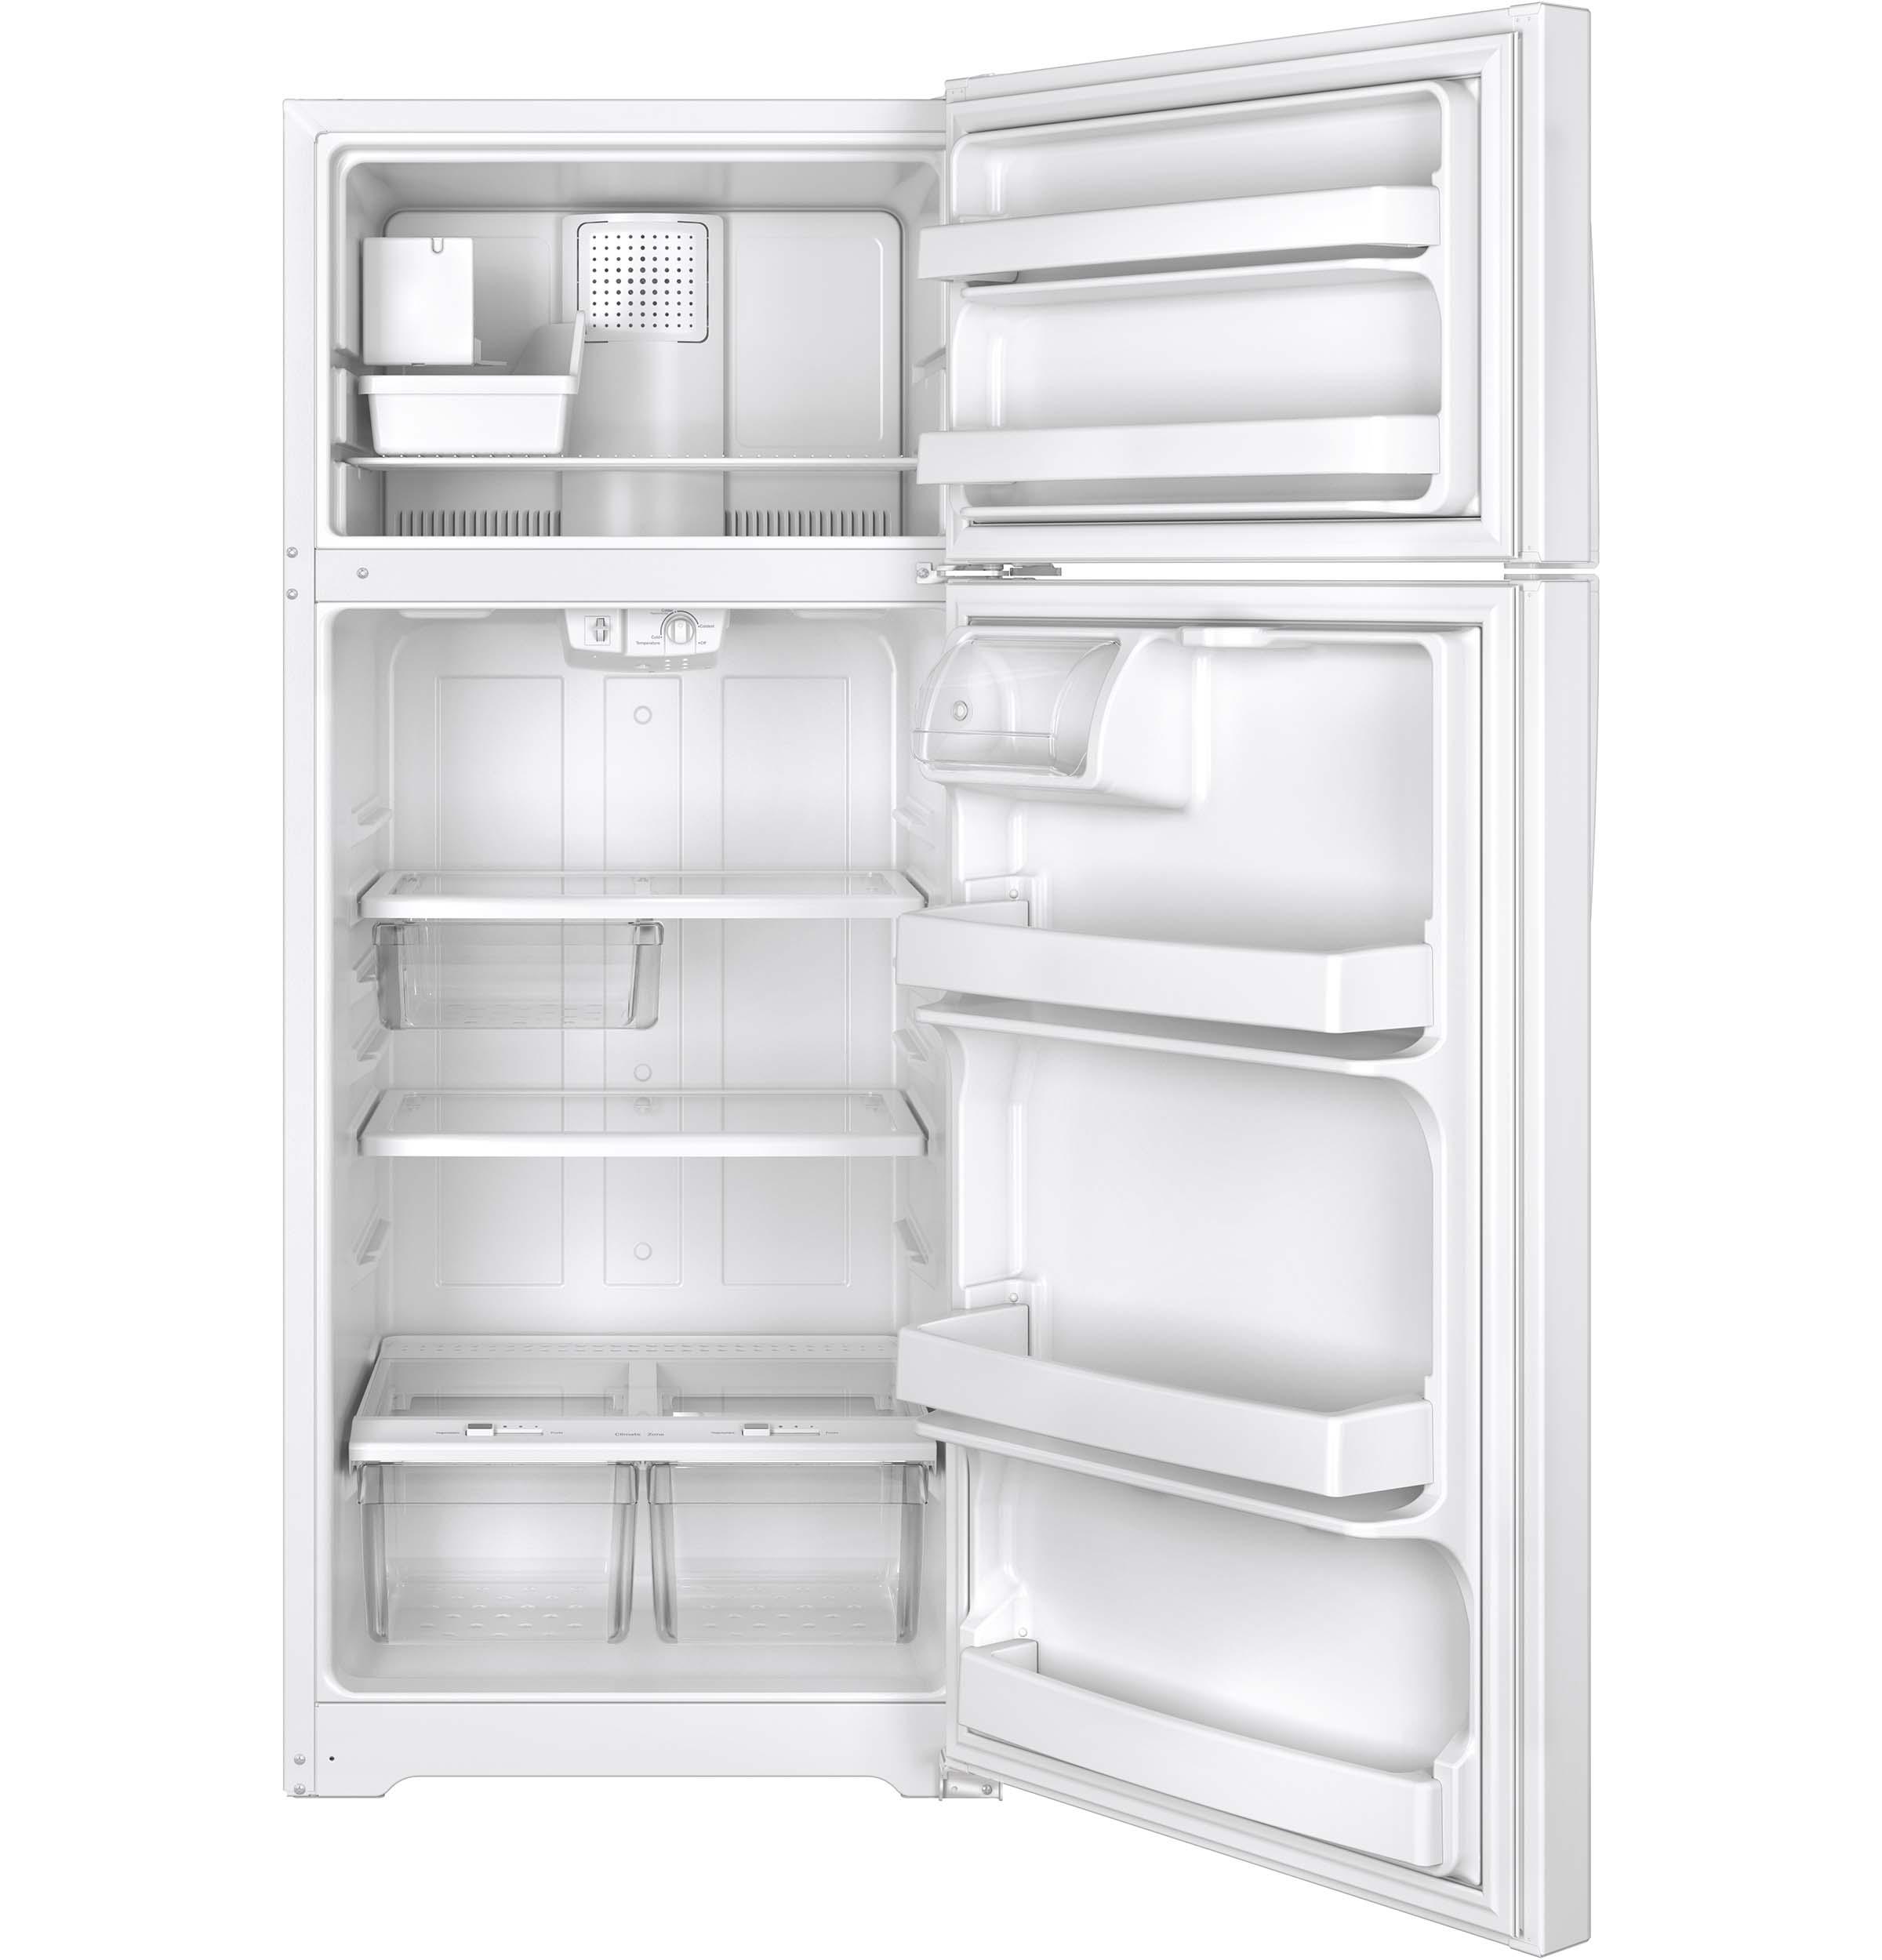 Model: GIE18GTHWW   GE GE® ENERGY STAR® 17.5 Cu. Ft. Top-Freezer Refrigerator